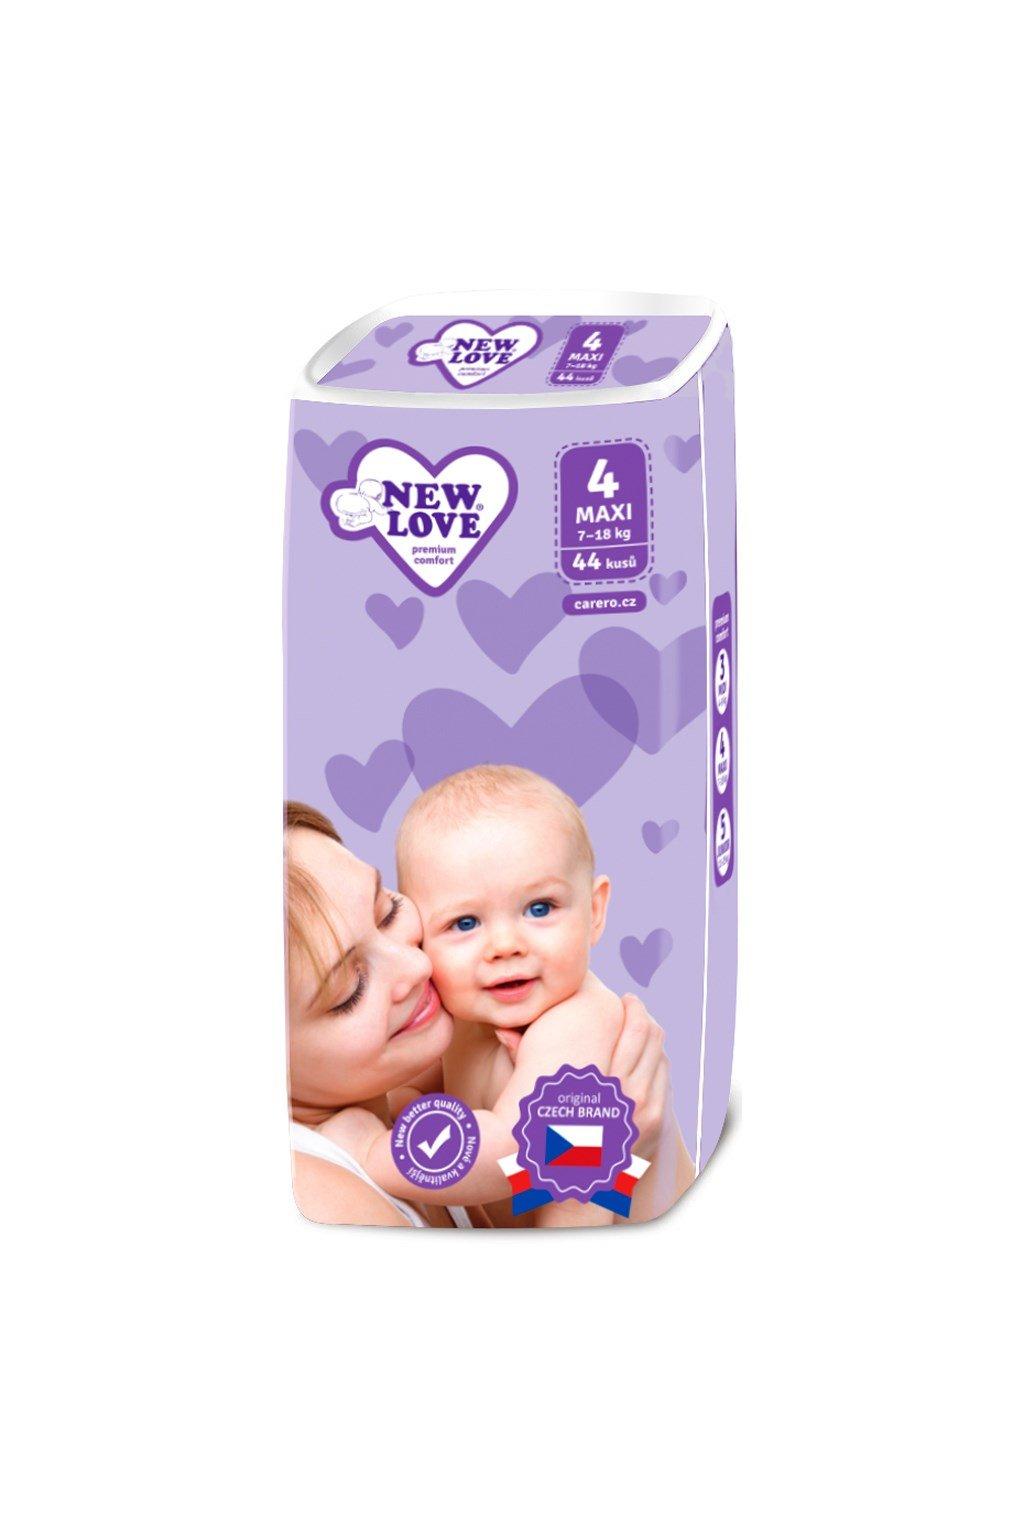 Detské jednorázové plienky New Love Premium comfort 4 MAXI 7-18 kg 44 ks